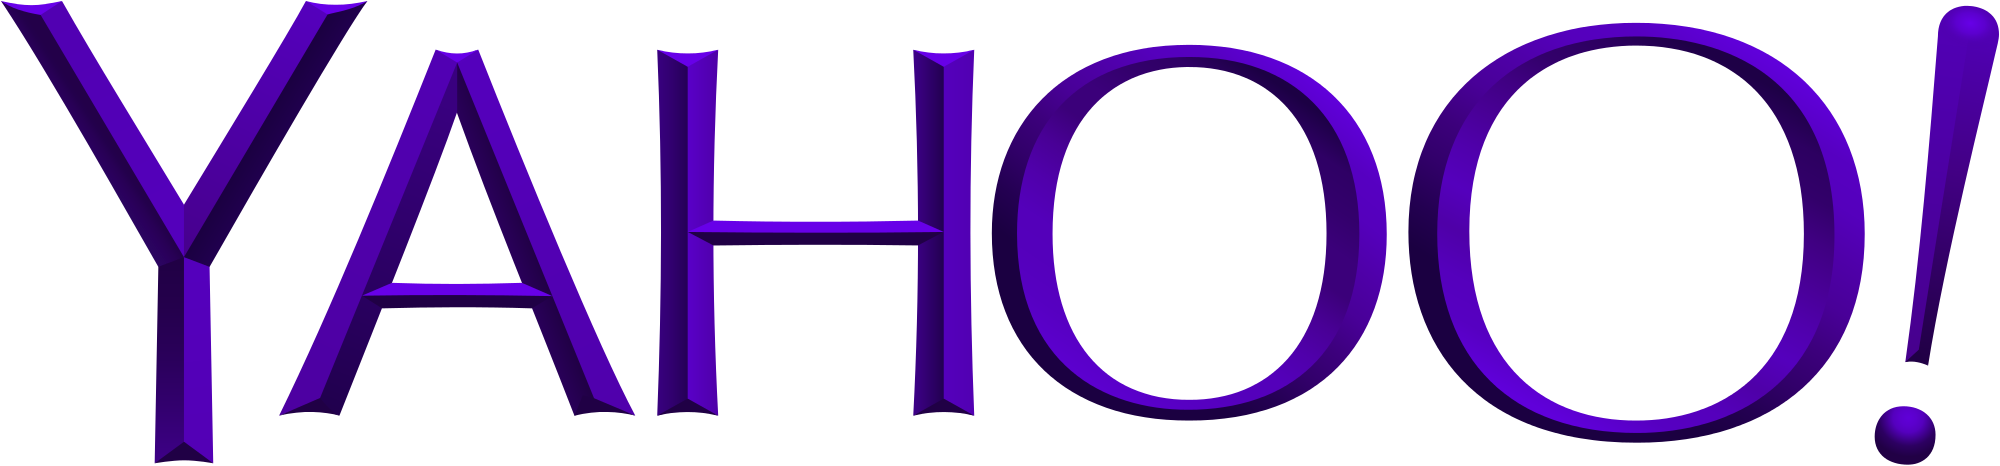 2000px-Yahoo!_logo